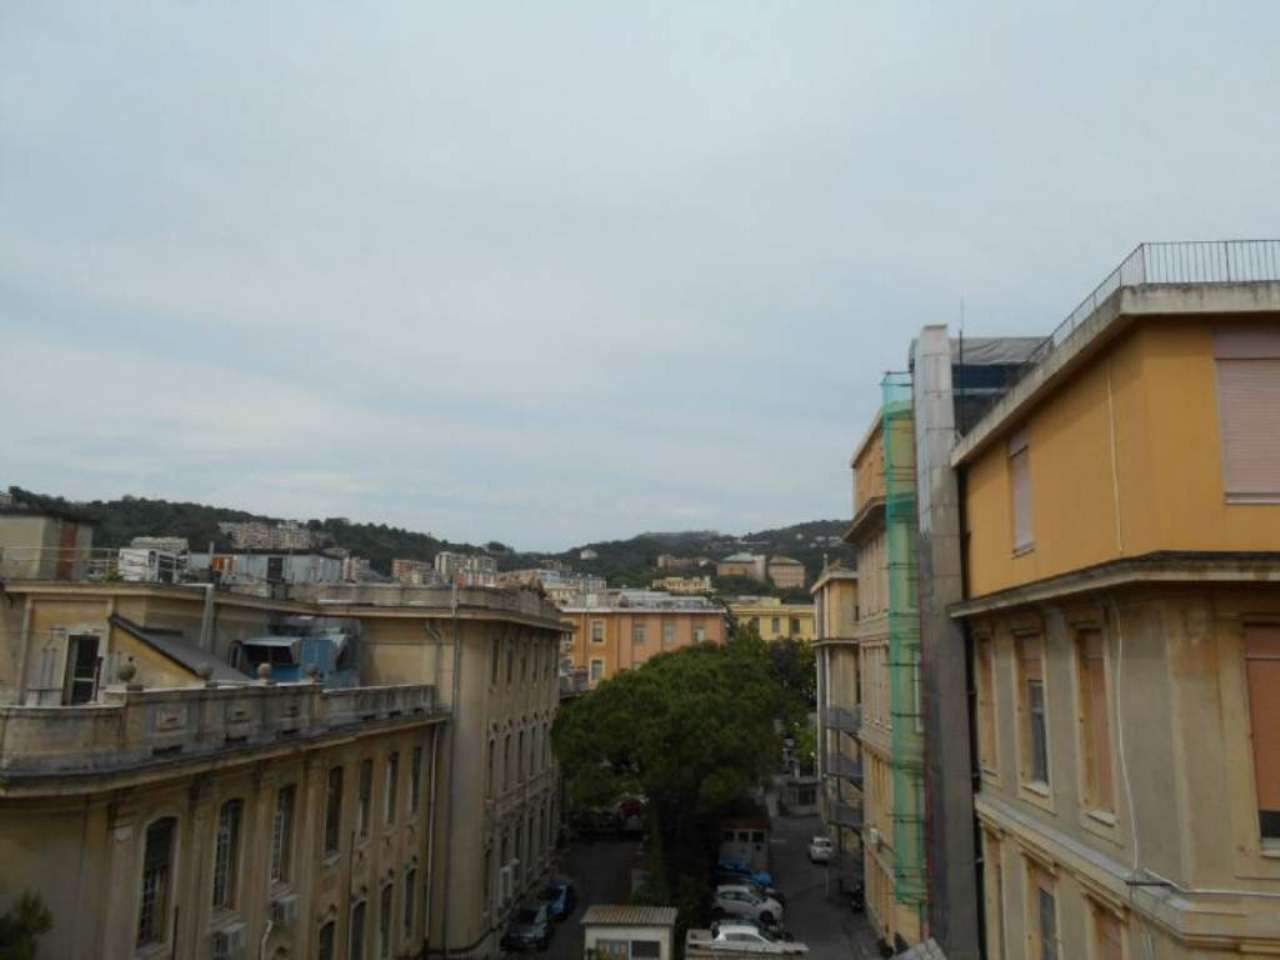 Bilocale Genova Via L.b. Albertis 6